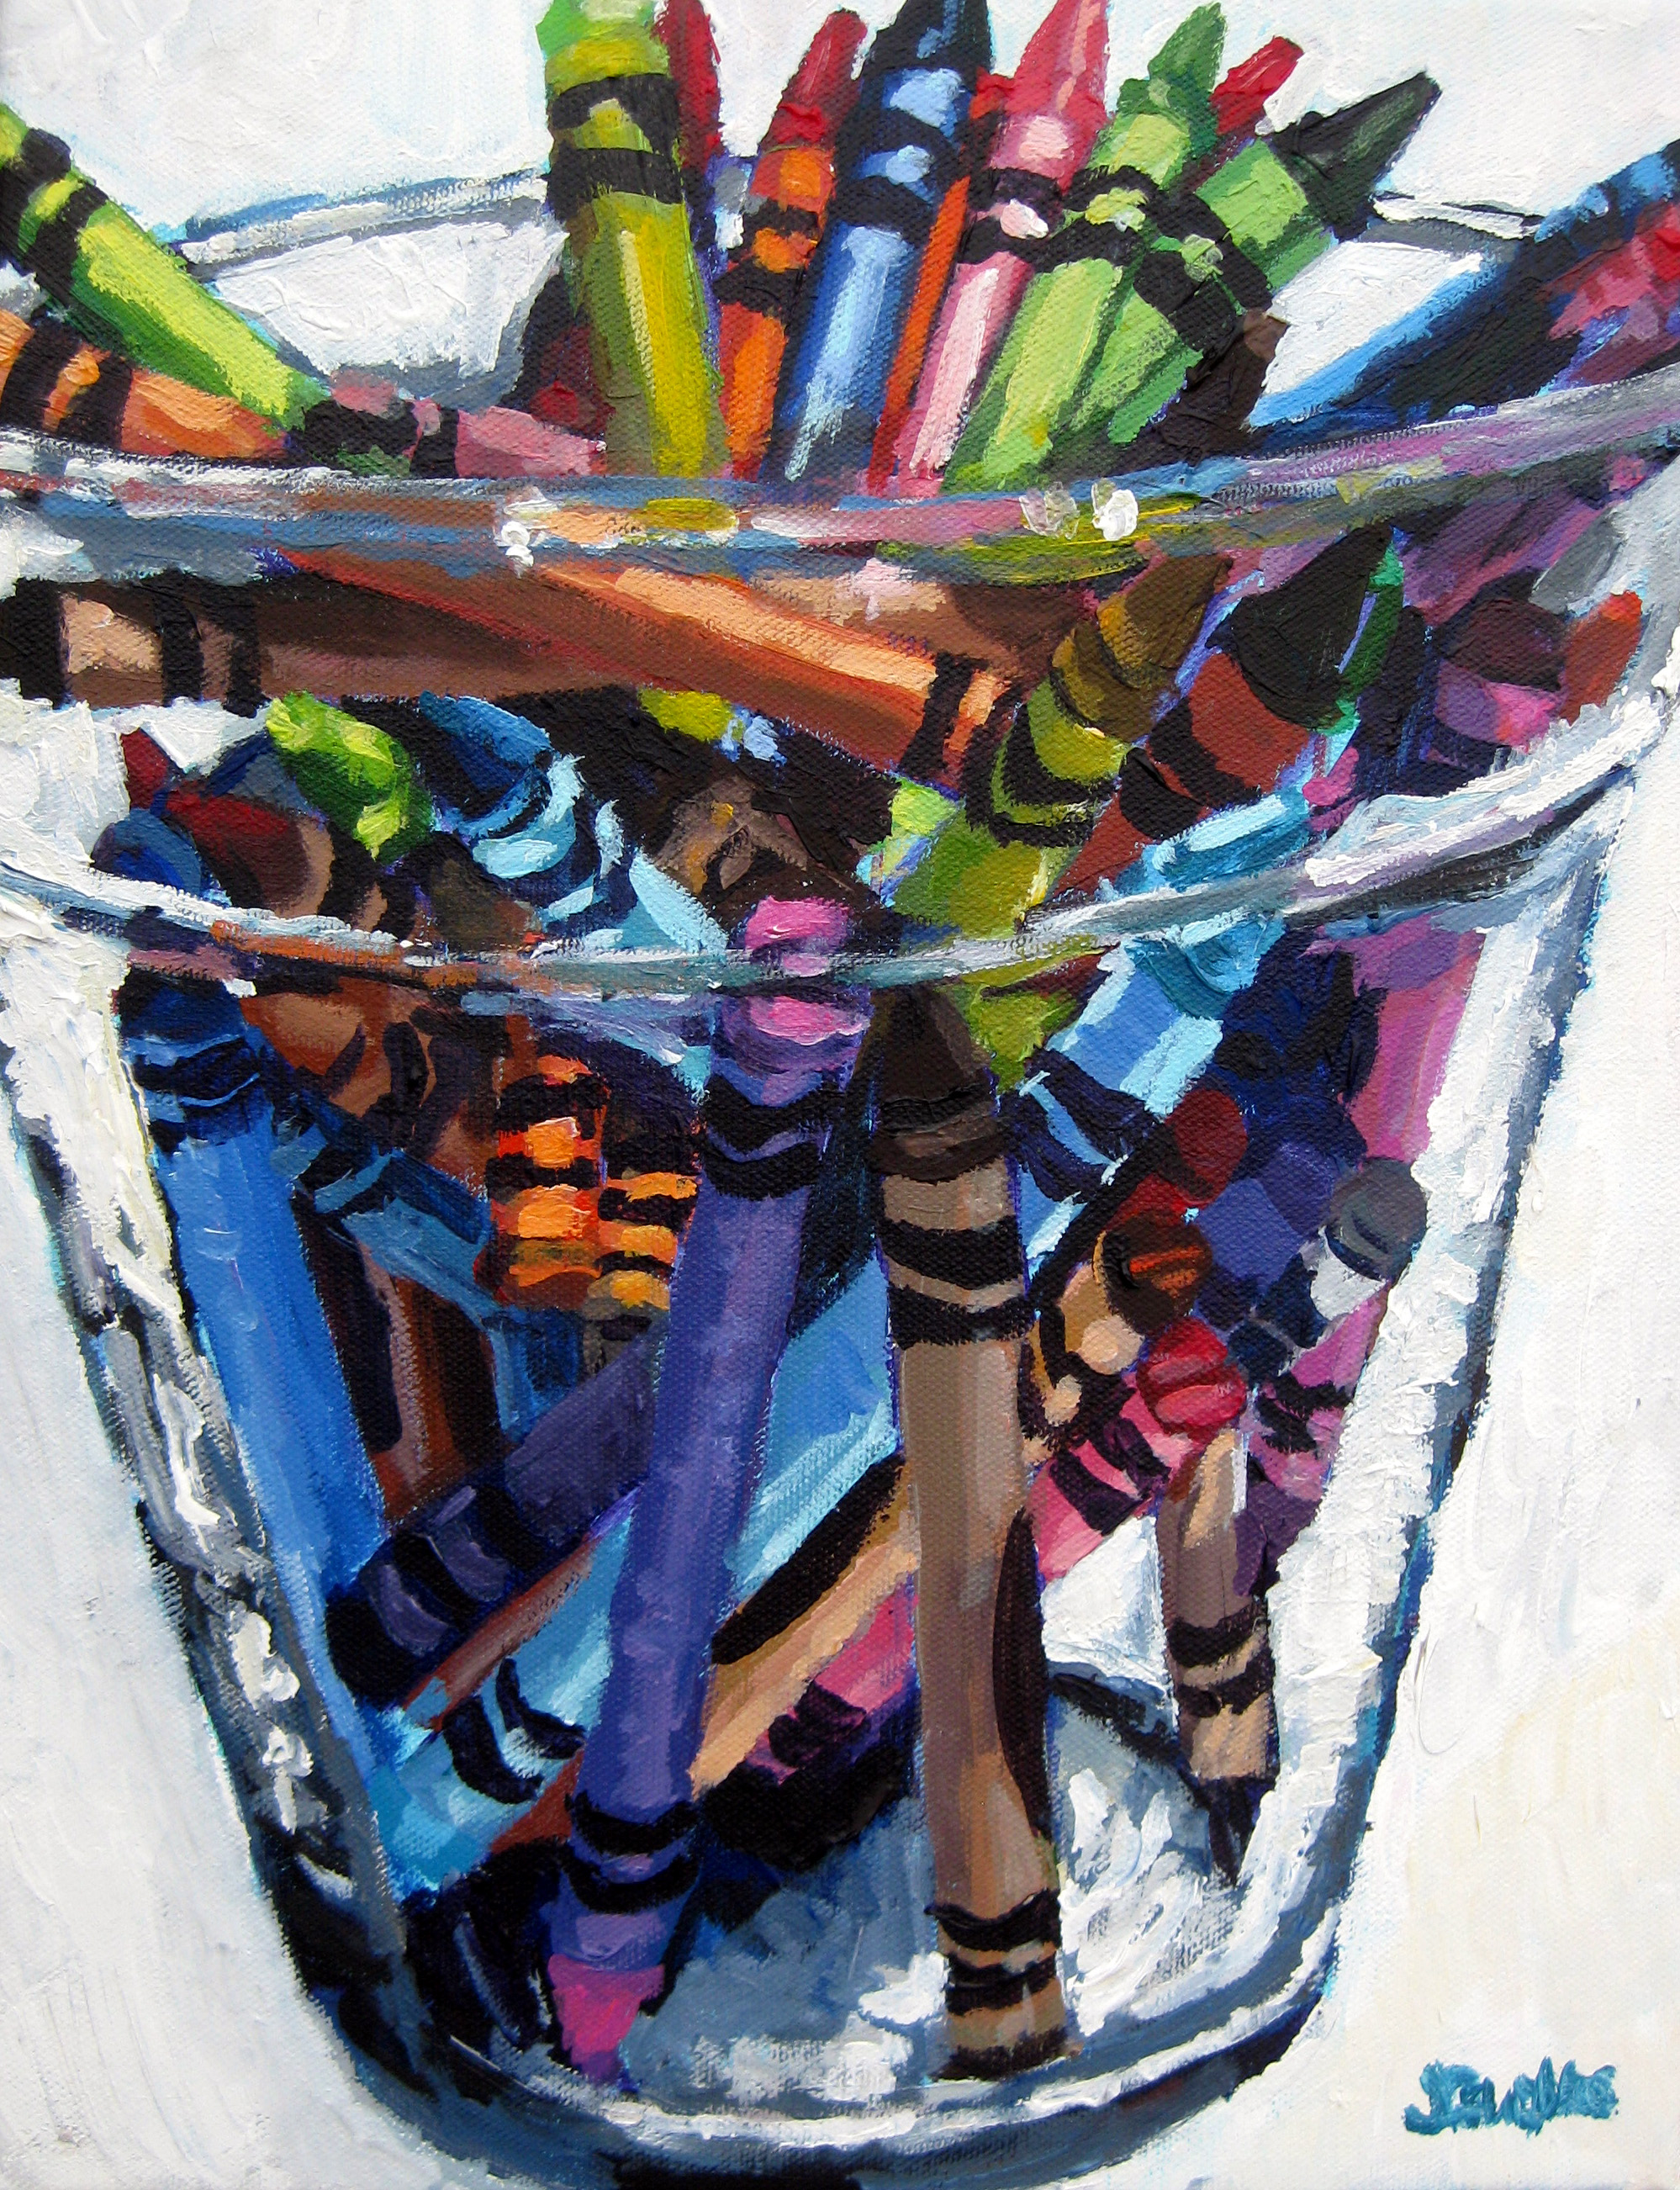 Crayons 3 11x14